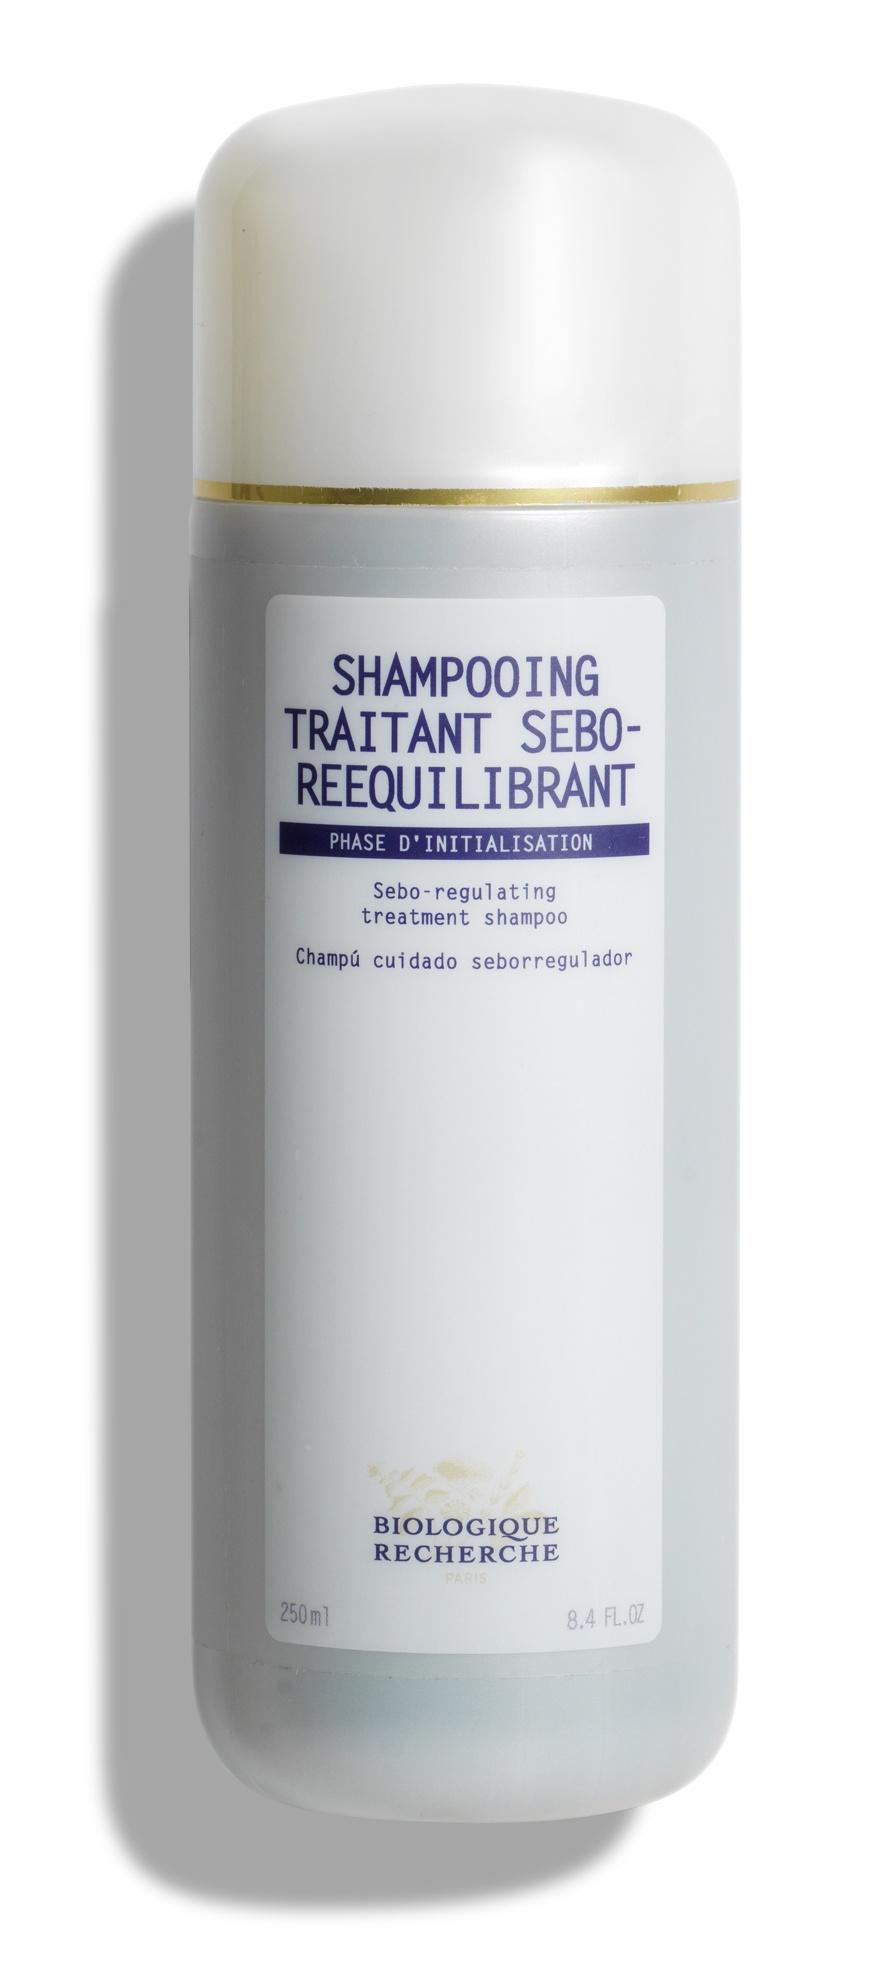 Biologique Recherche Shampooing Sebo - Reequilibrant